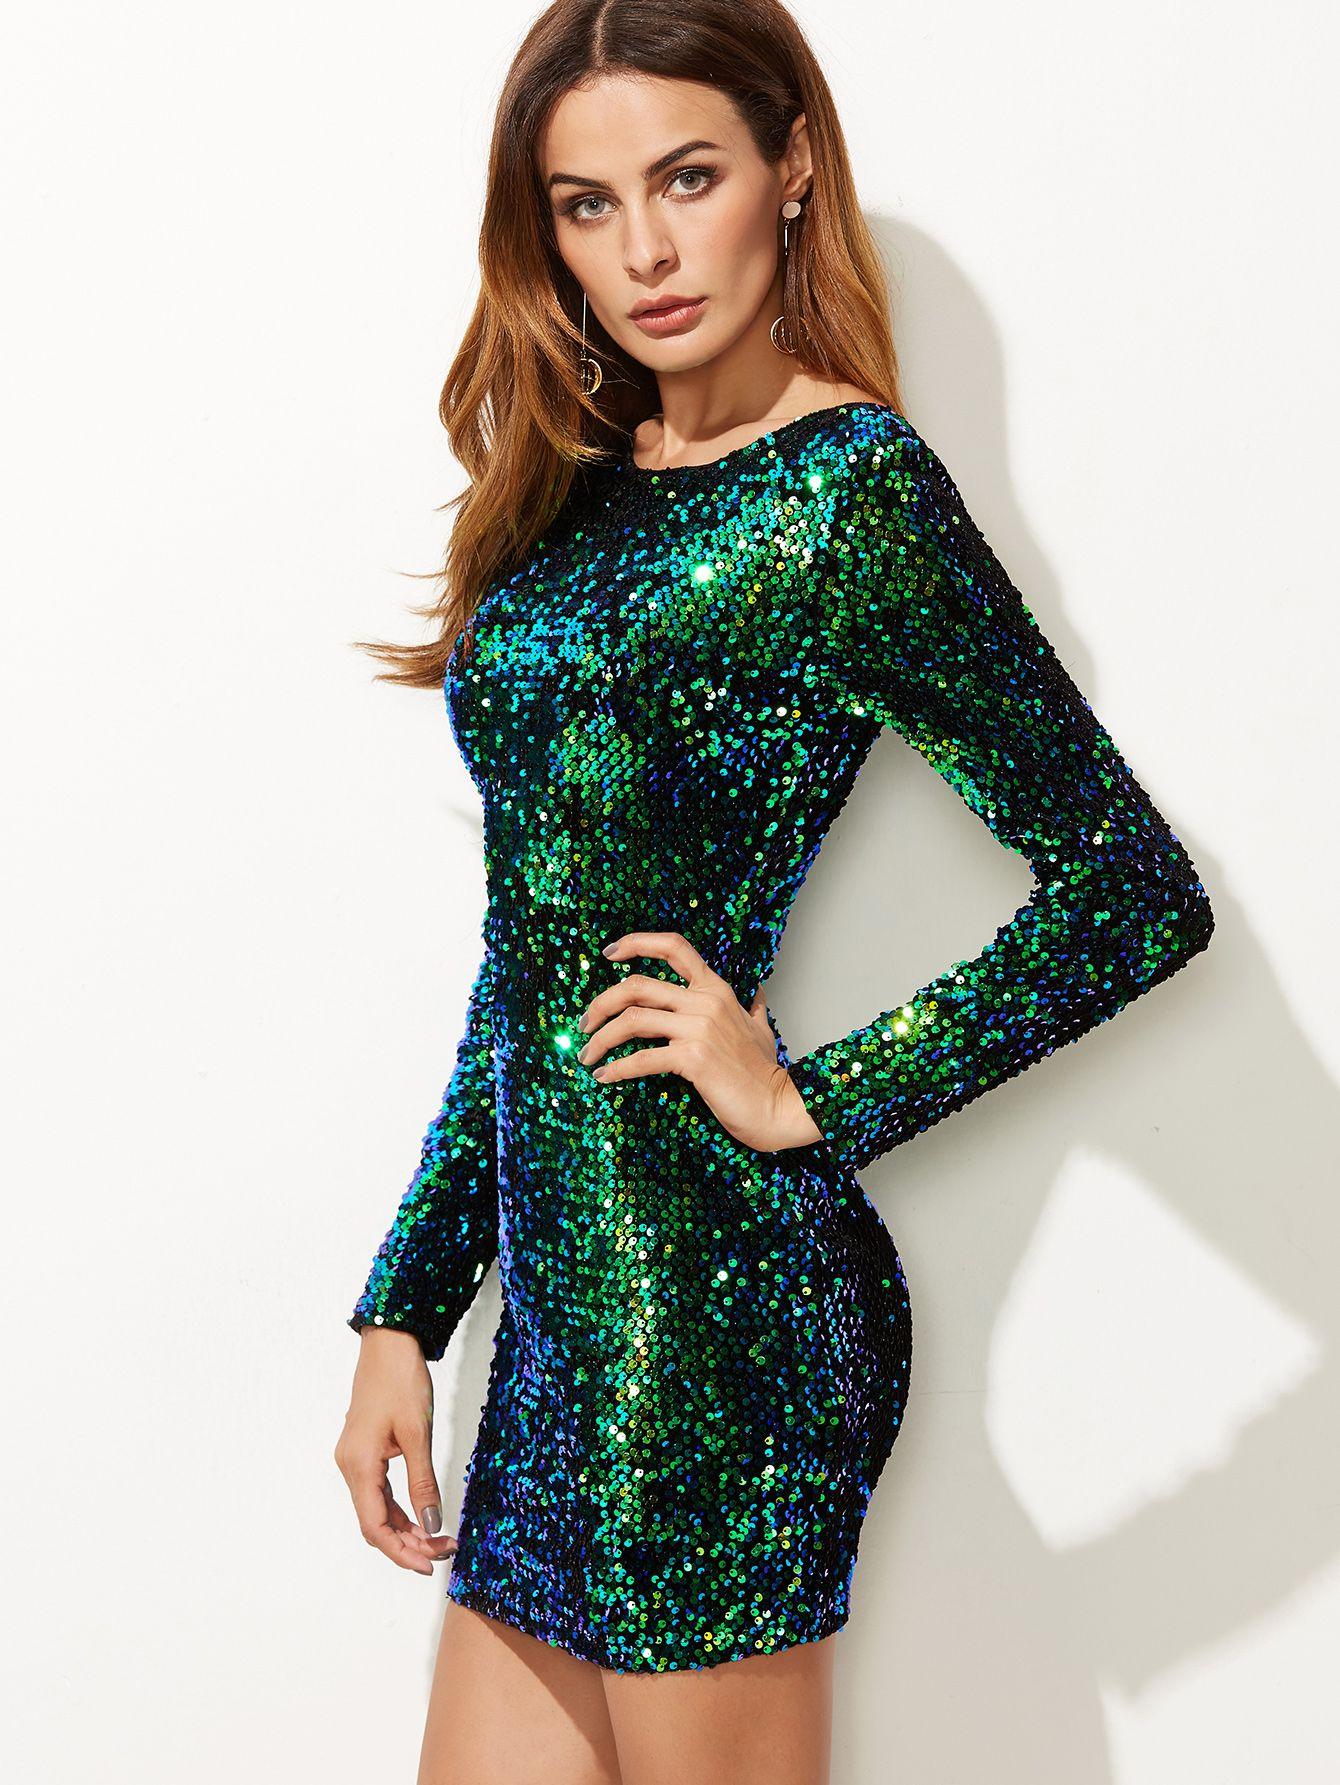 Paillette Bodycon Kleid langarm | Kleider, Abendmode und Photoshooting